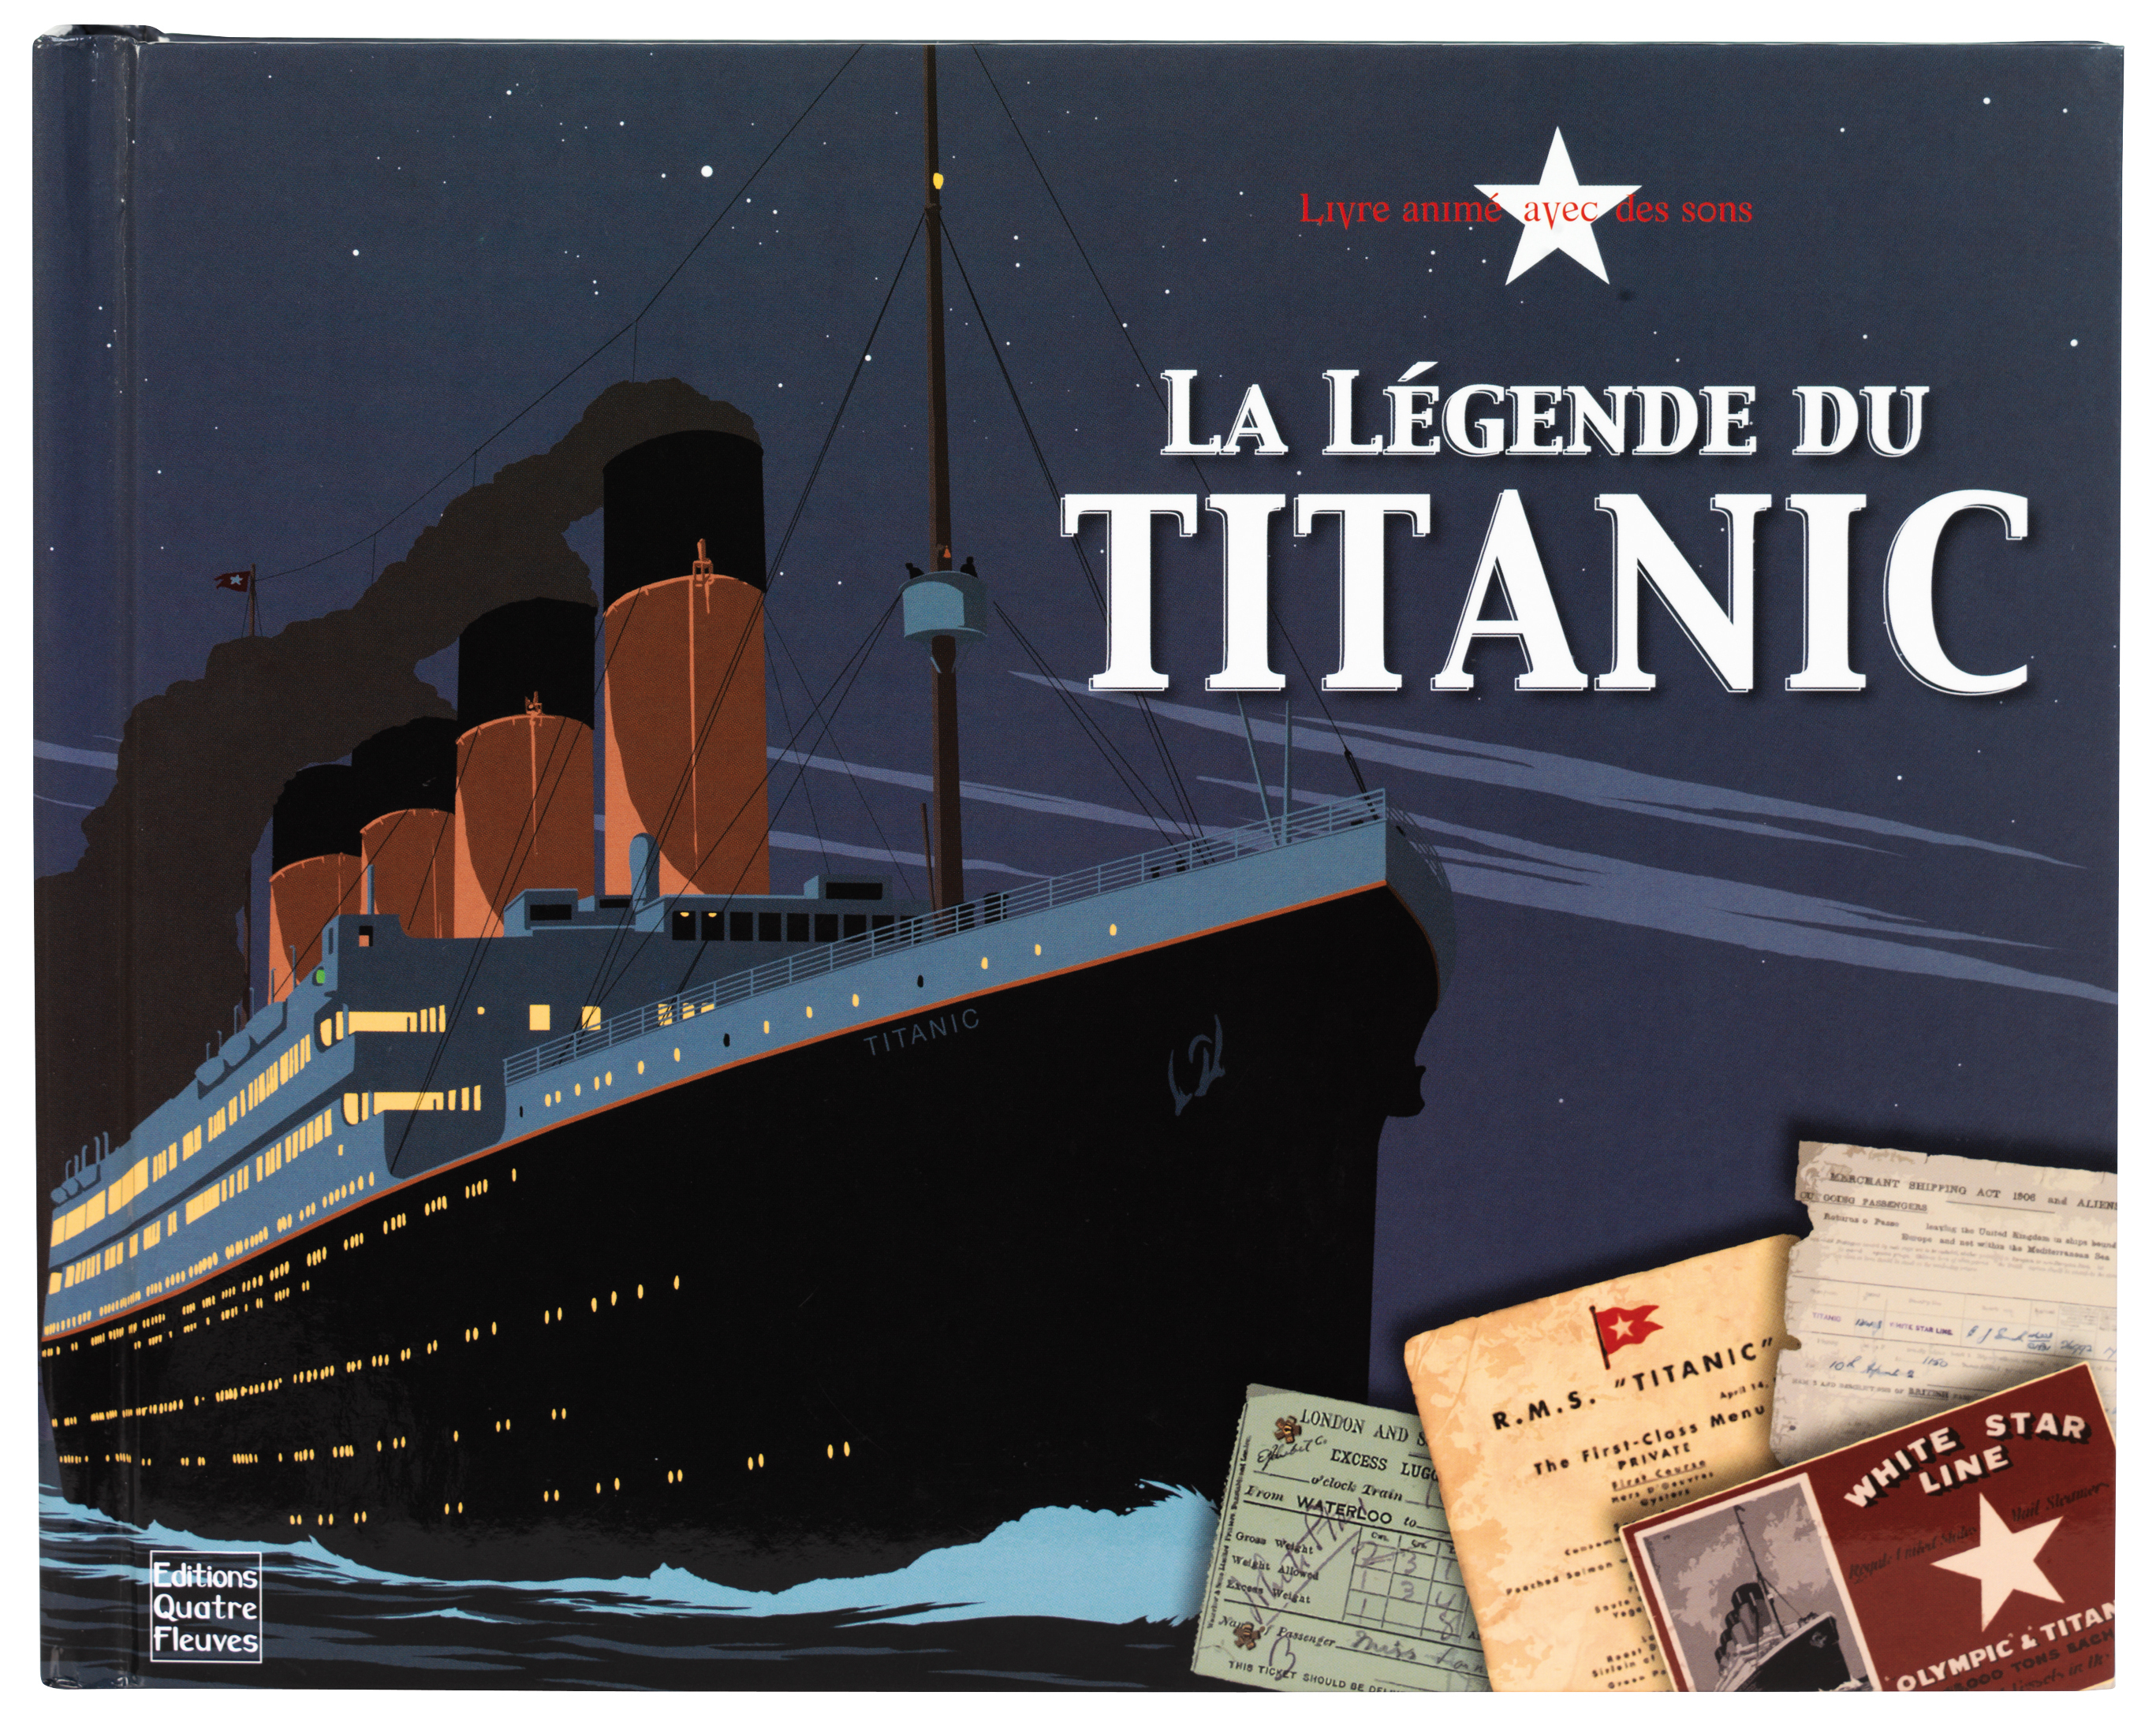 LA LEGENDE DU TITANIC